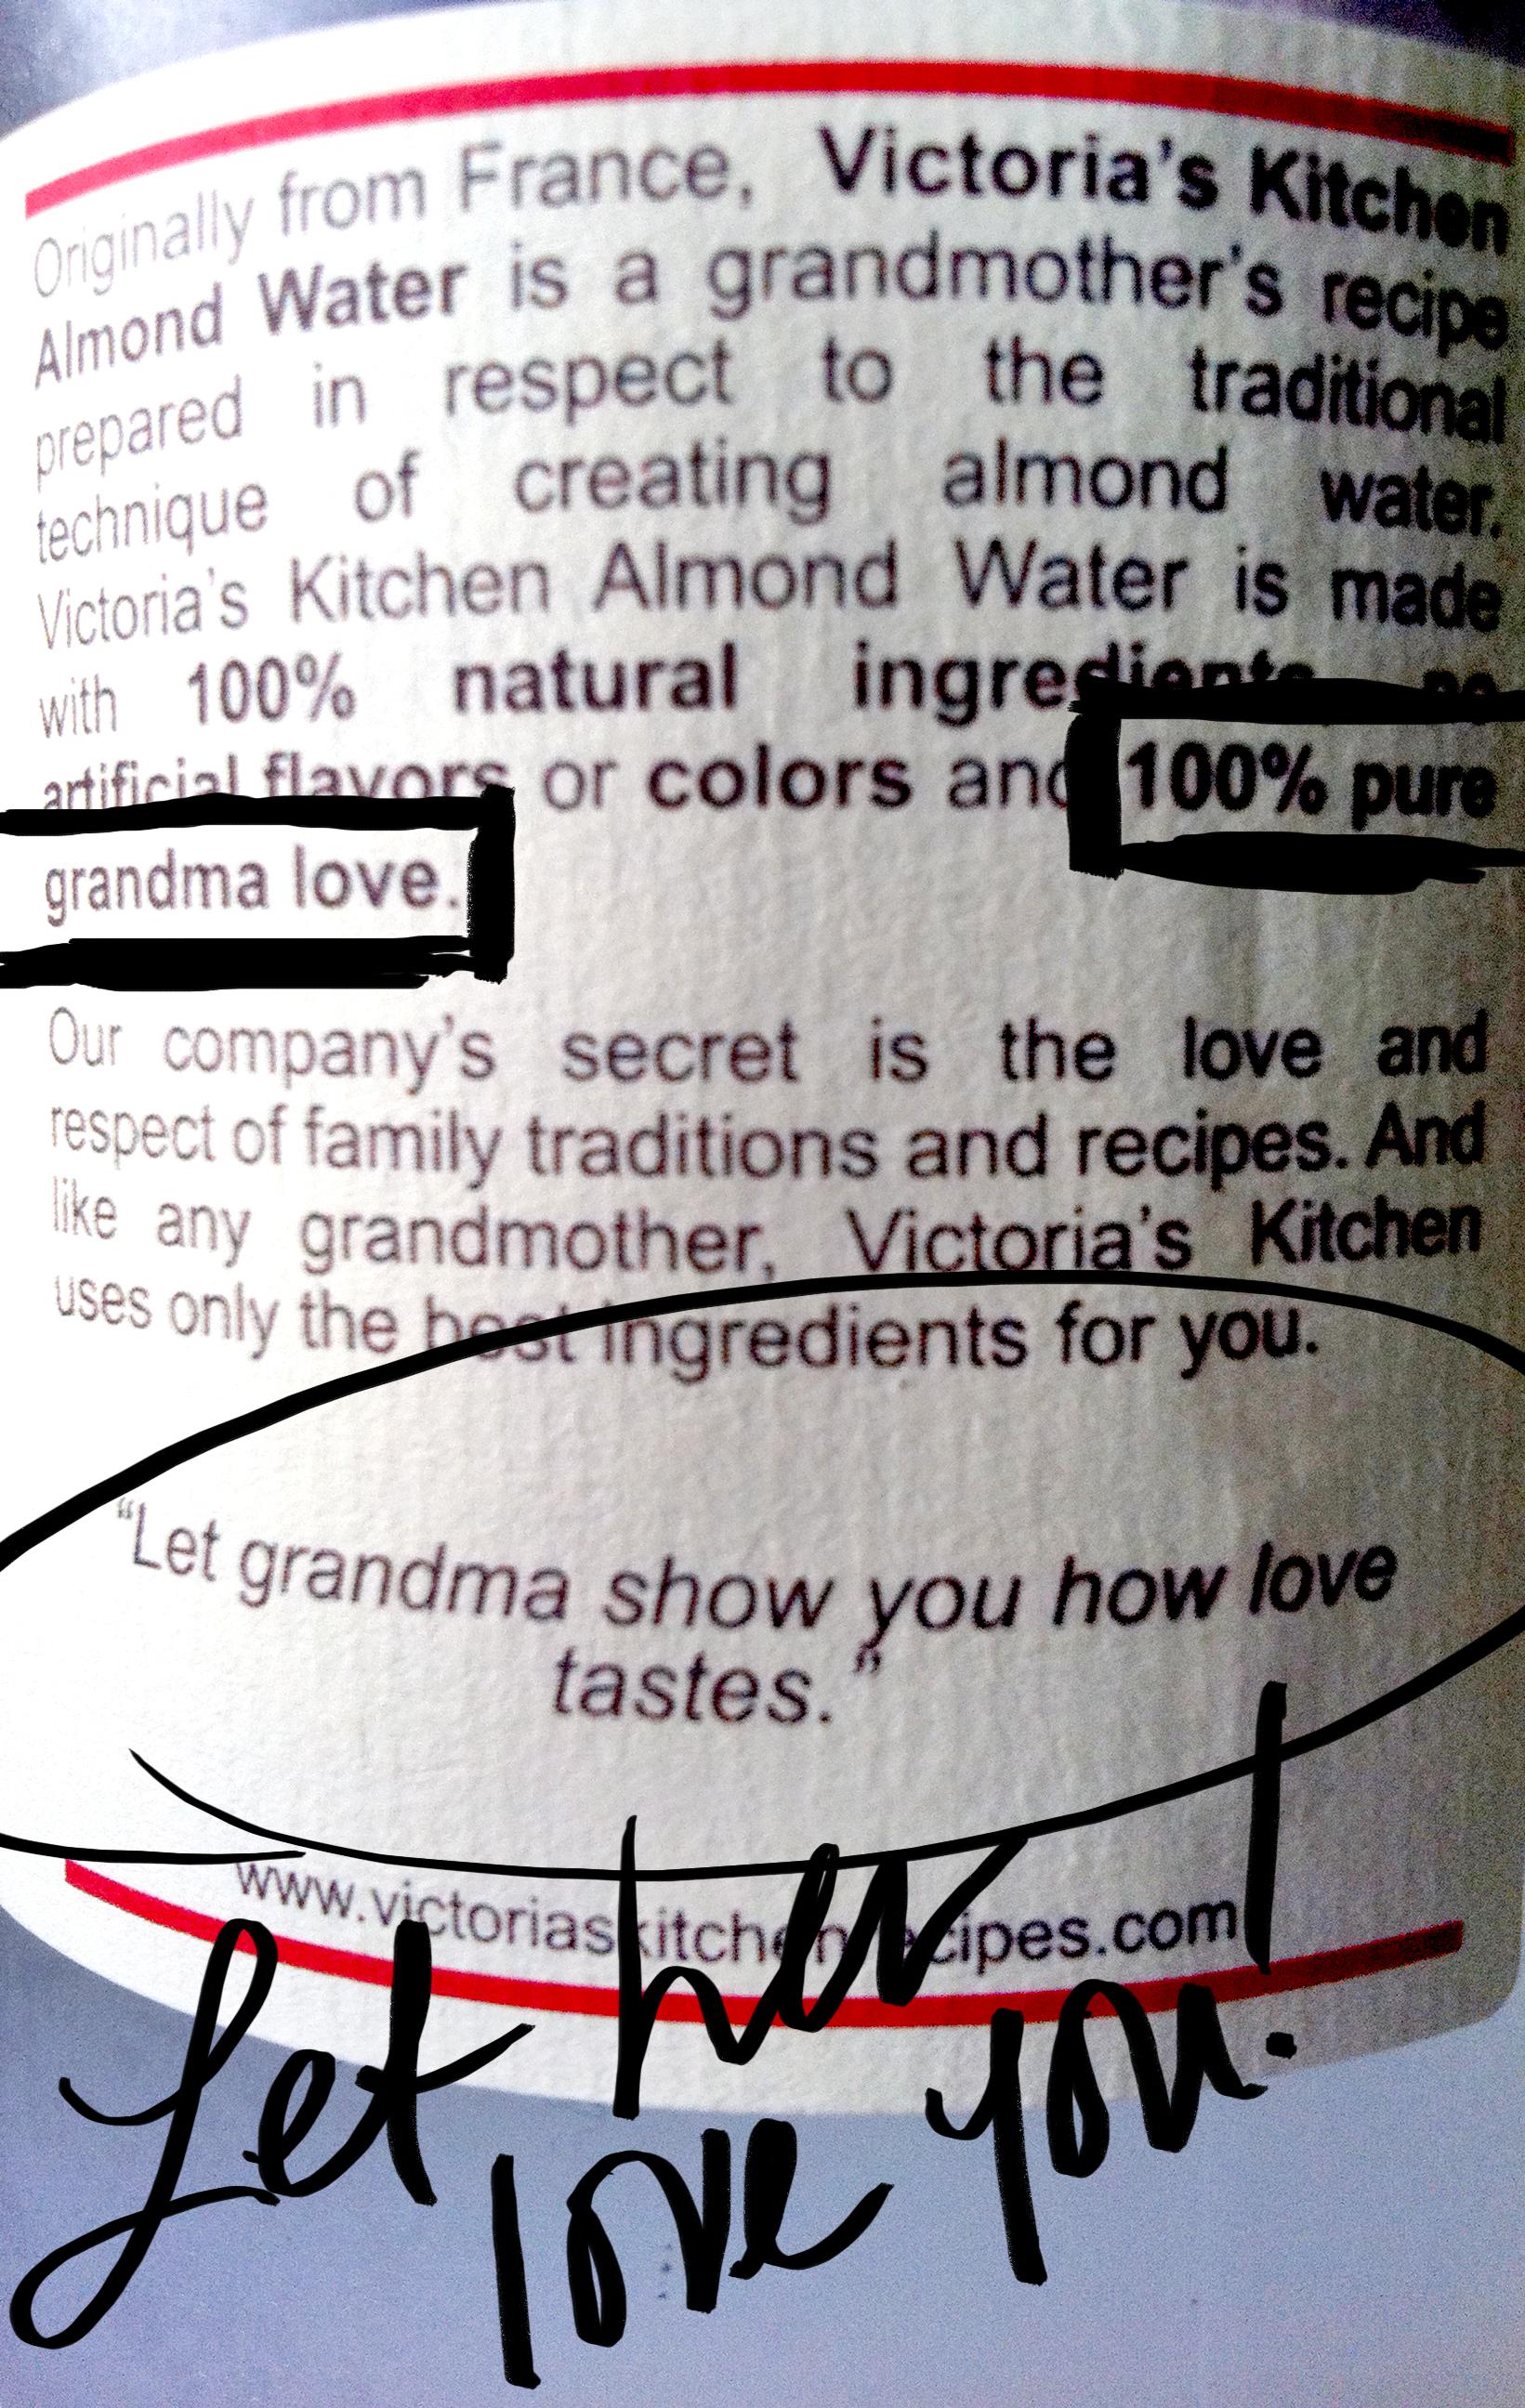 Drink 100% Grandma Love. – LALA LAND